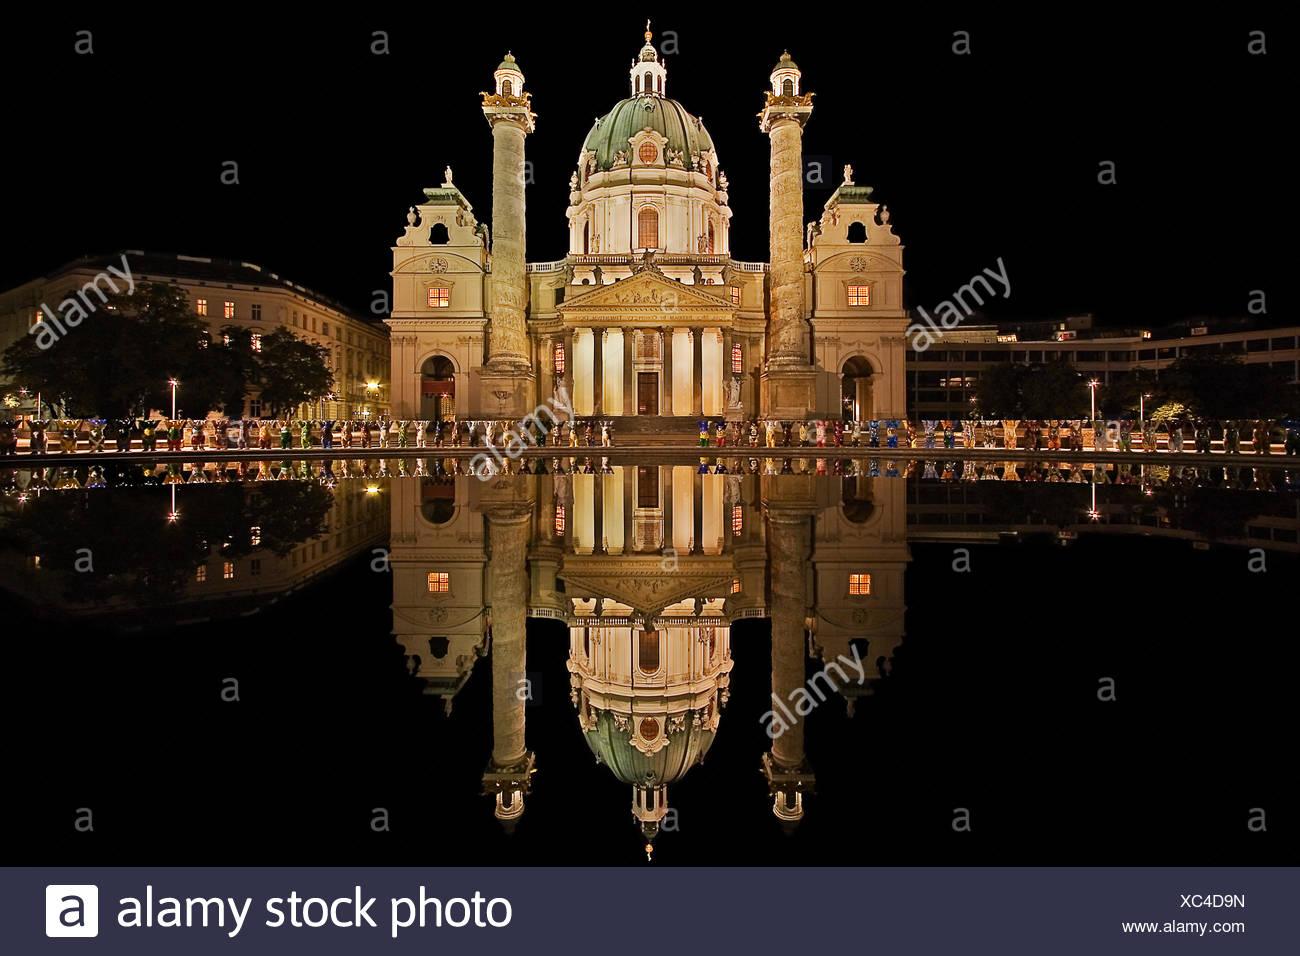 karlskirche vienna - feudal beleuchtung4a - Stock Image